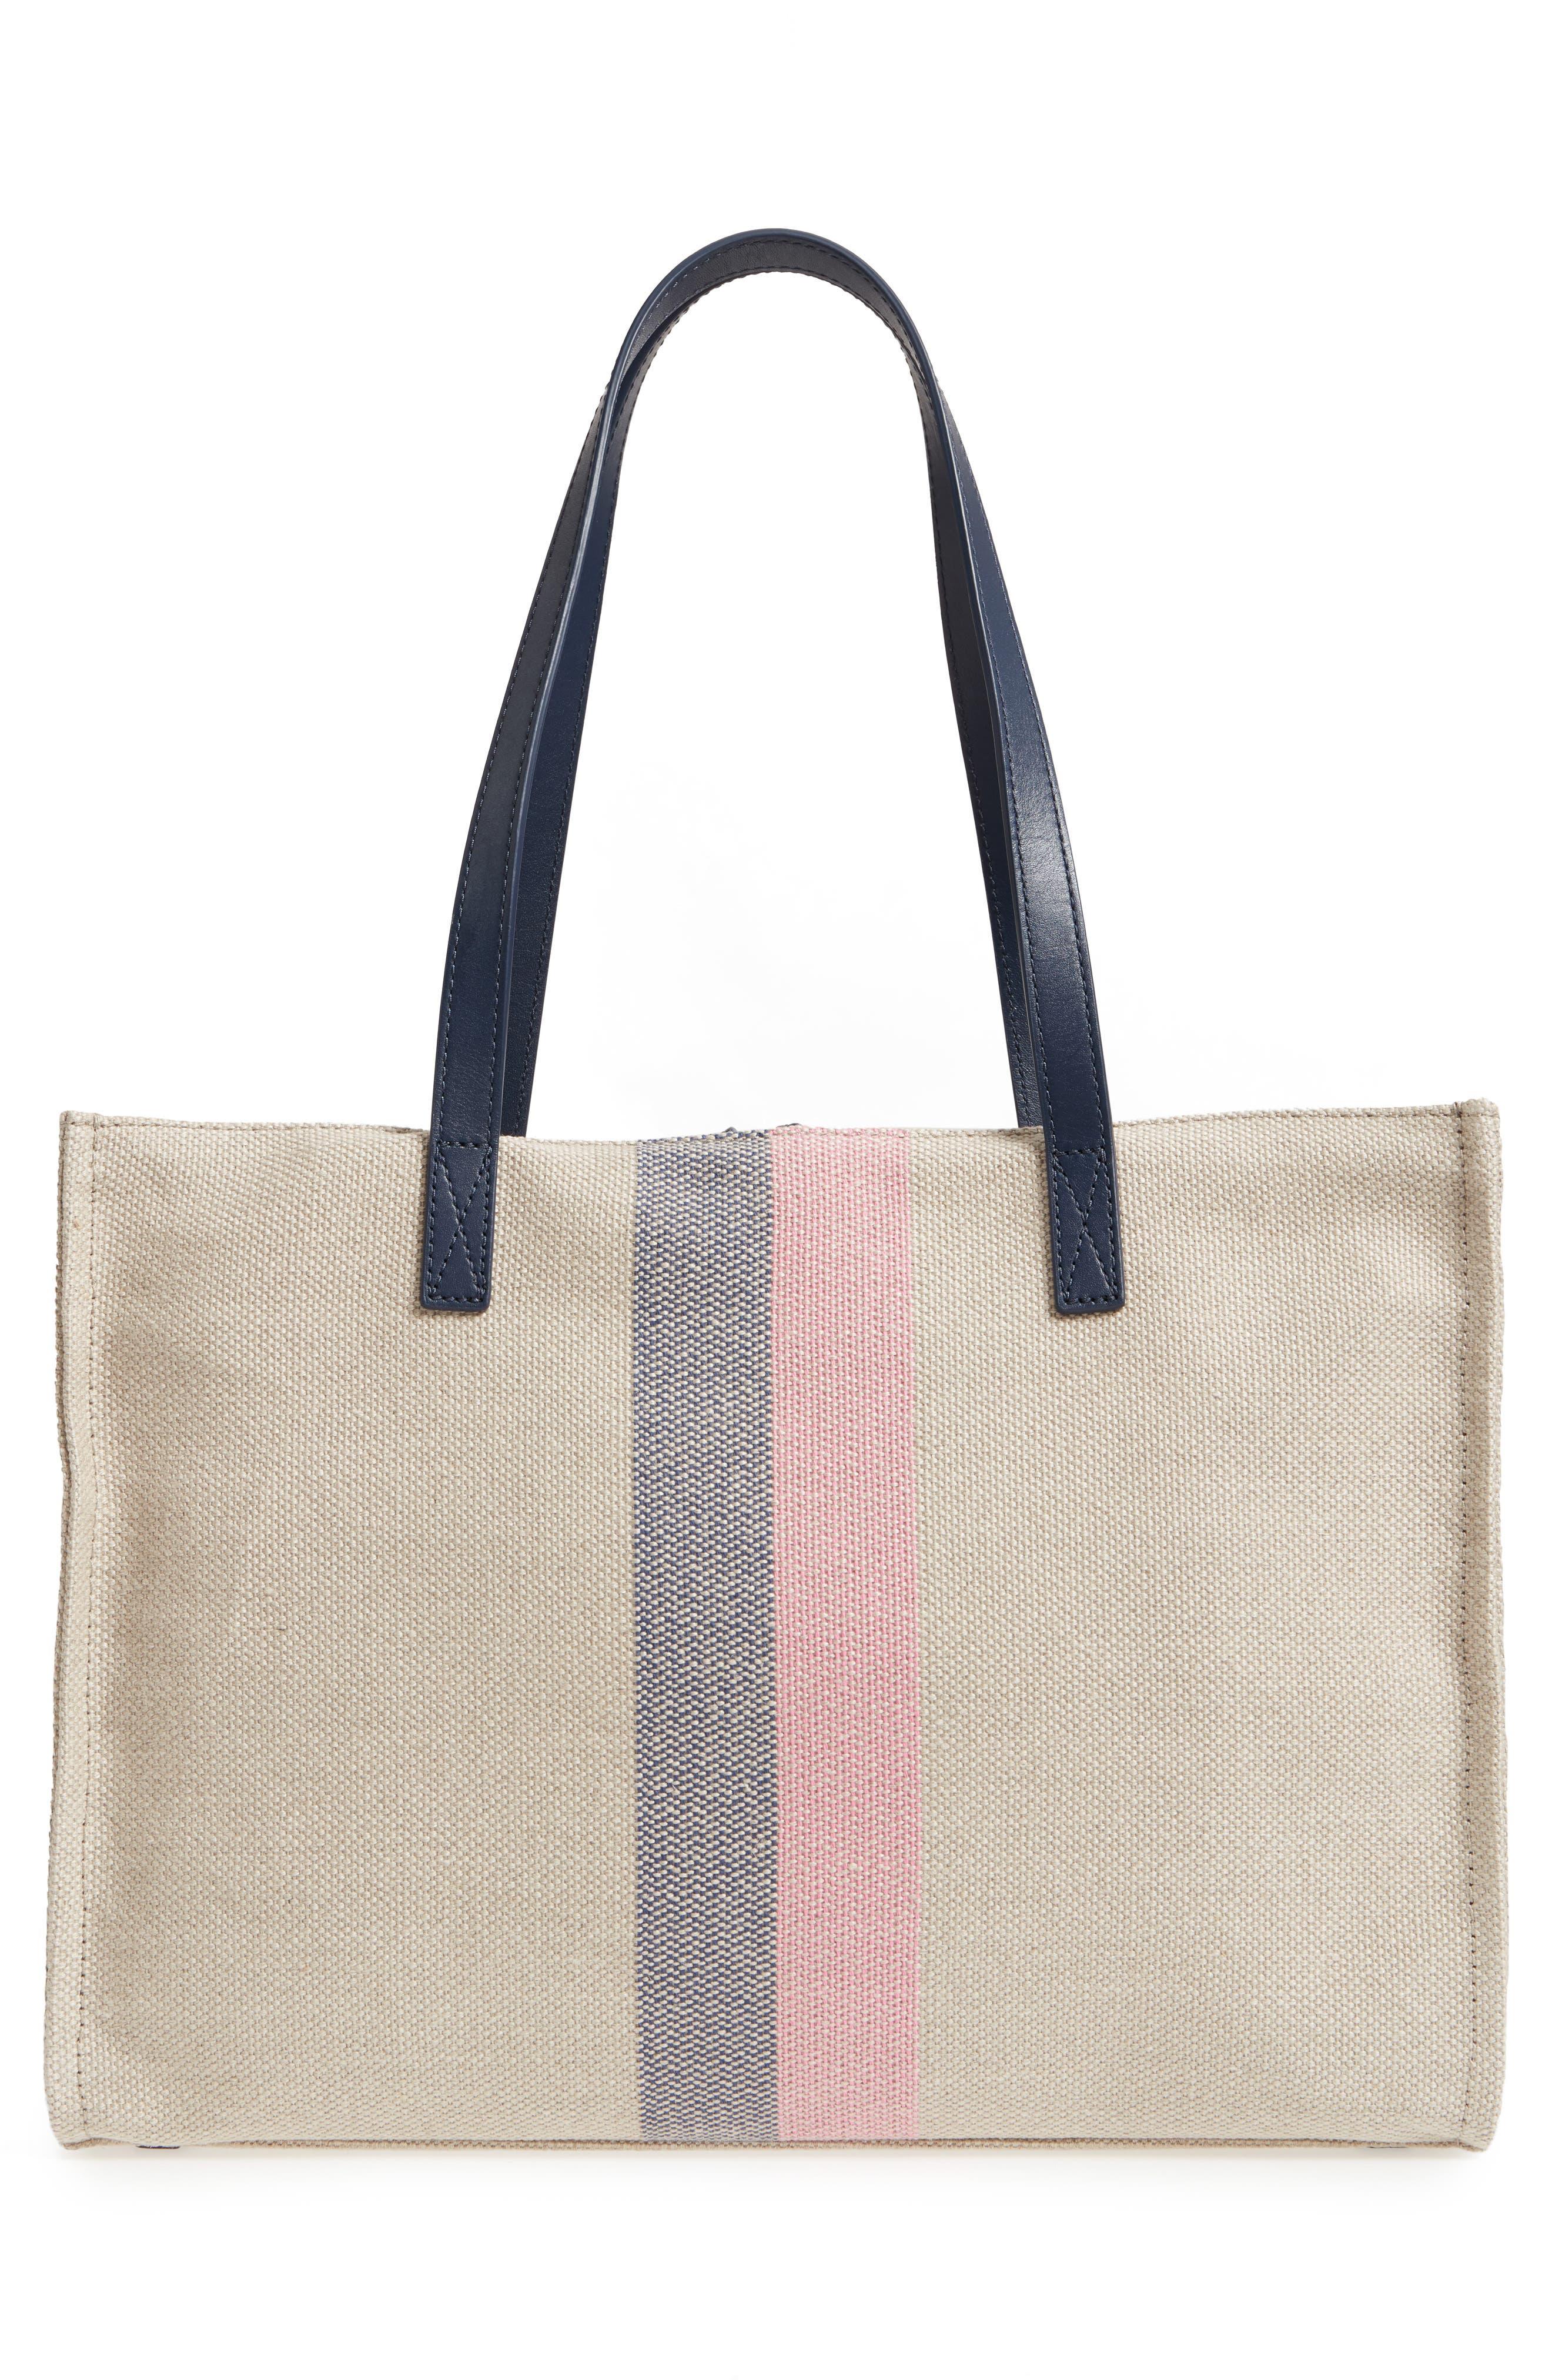 washington square - mega sam canvas satchel,                             Alternate thumbnail 3, color,                             Natural Linen/Bubble Gum/Navy